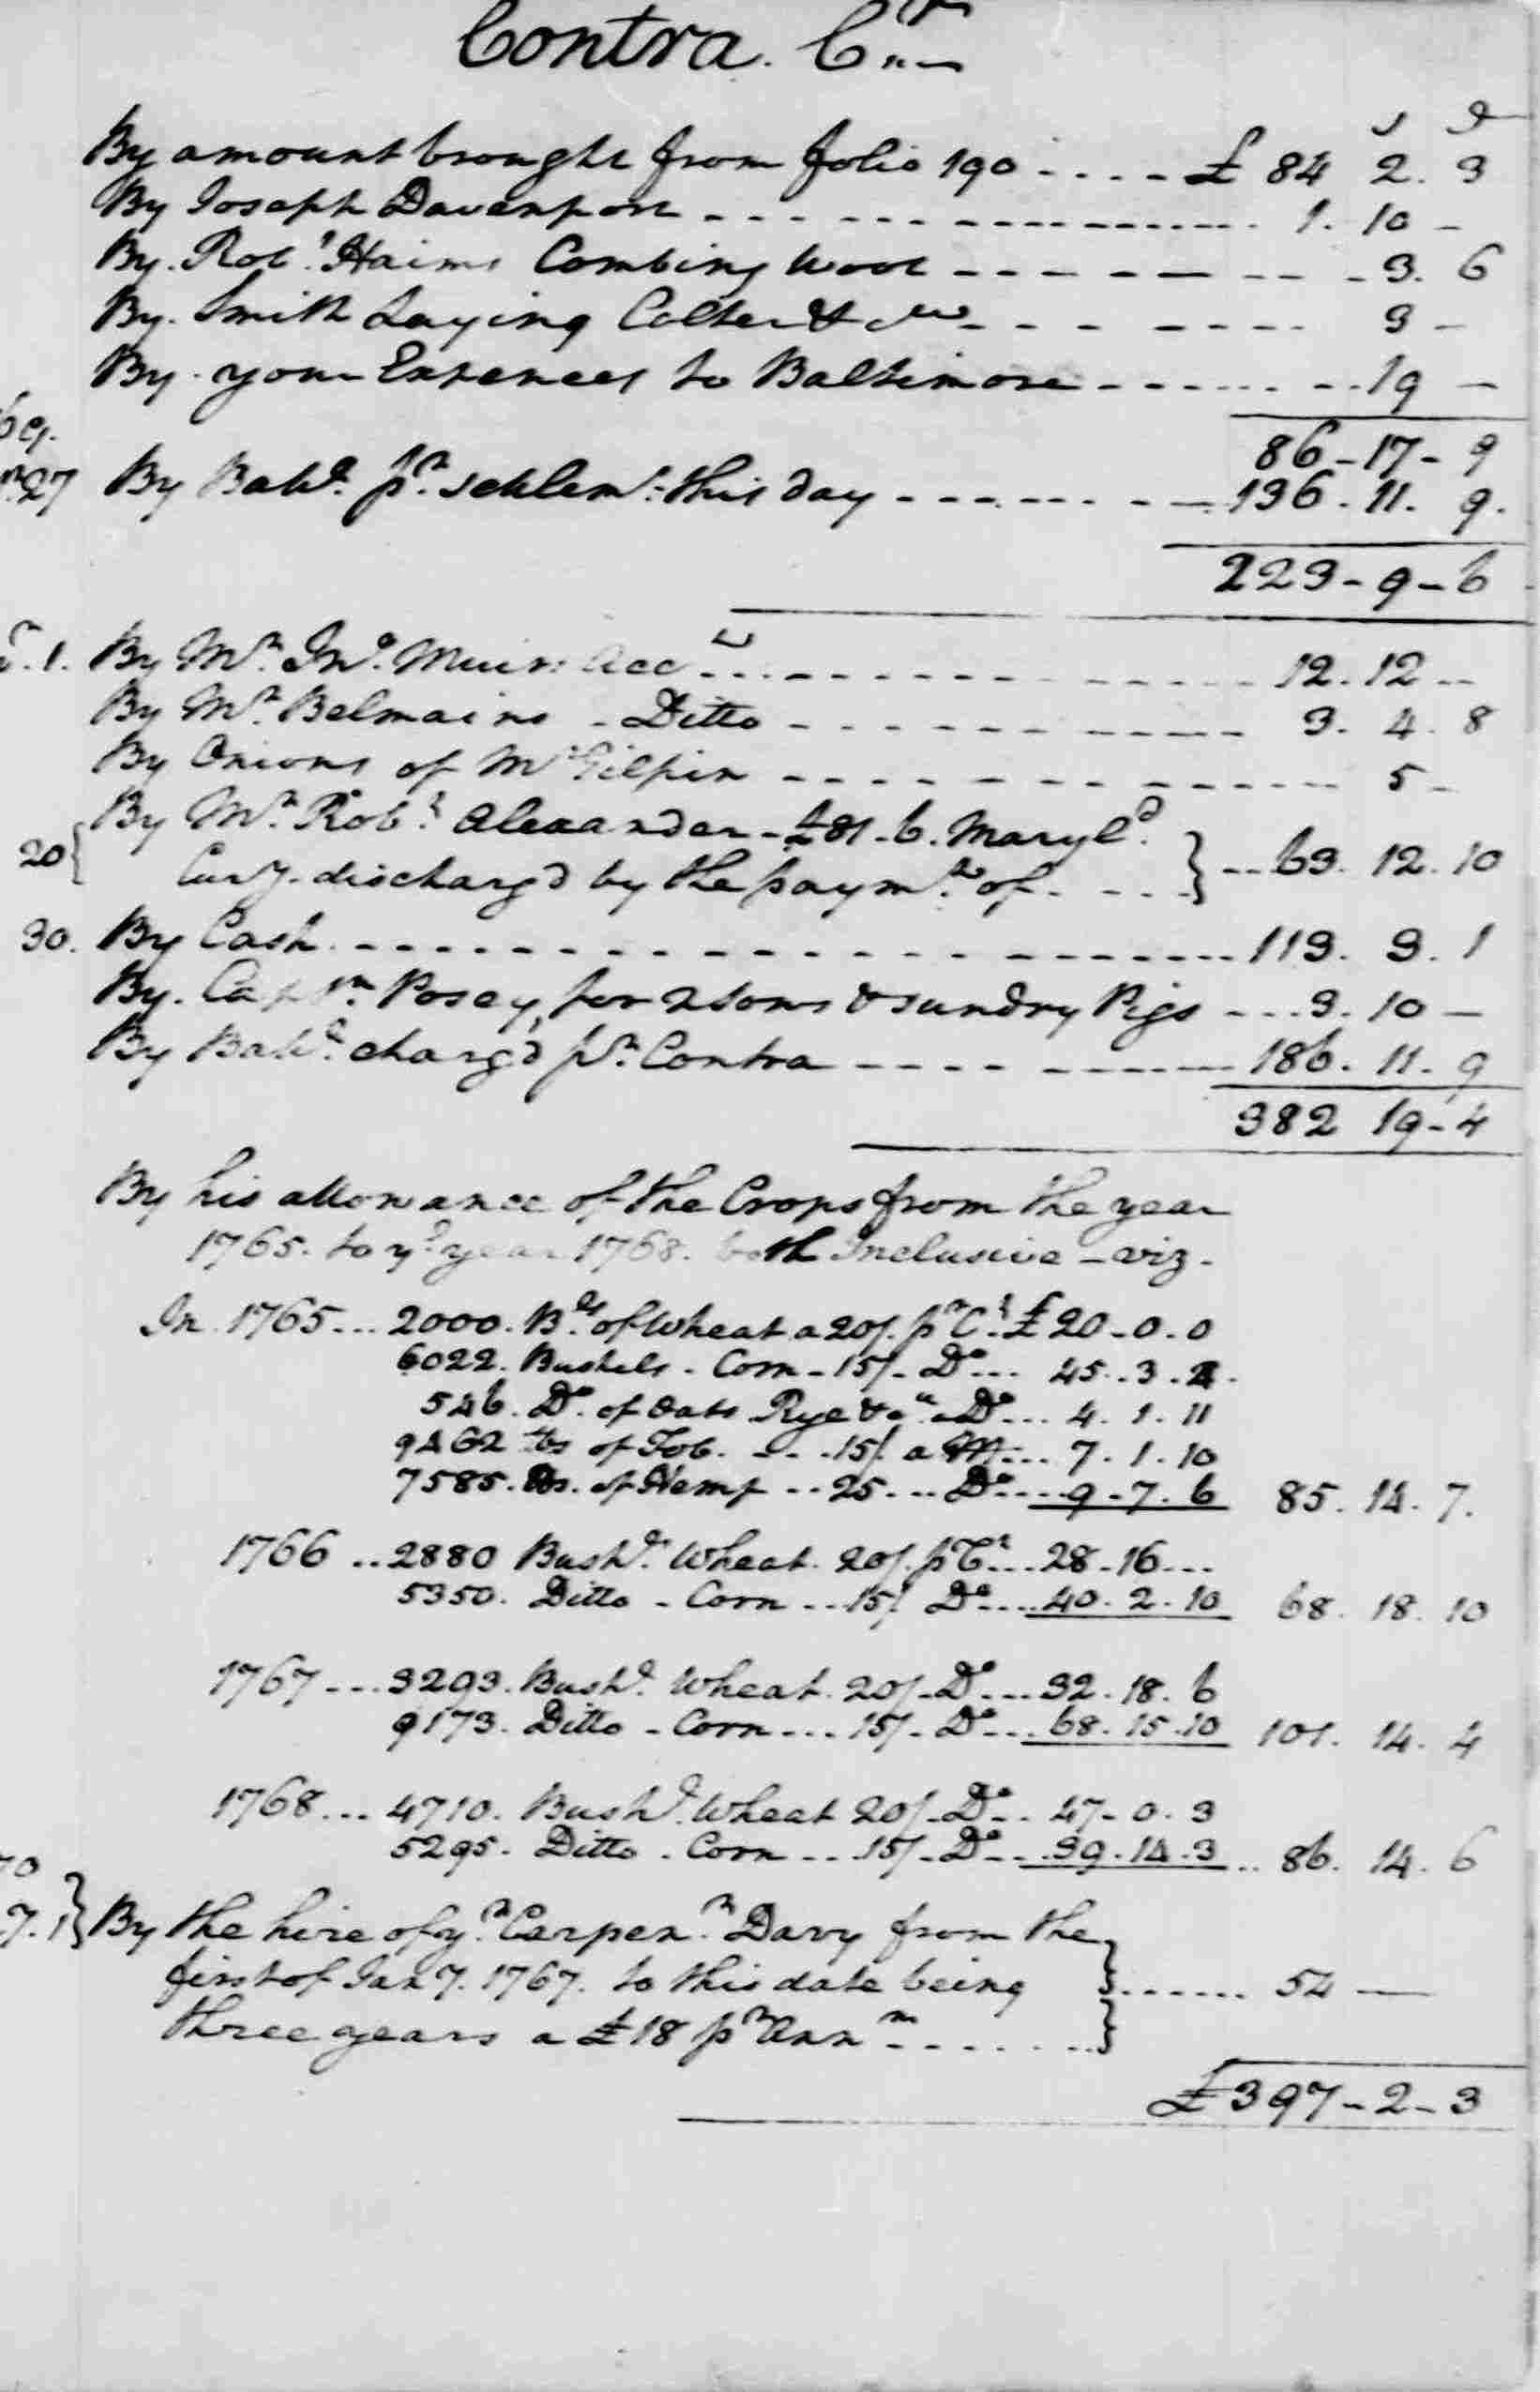 Ledger A, folio 297, right side